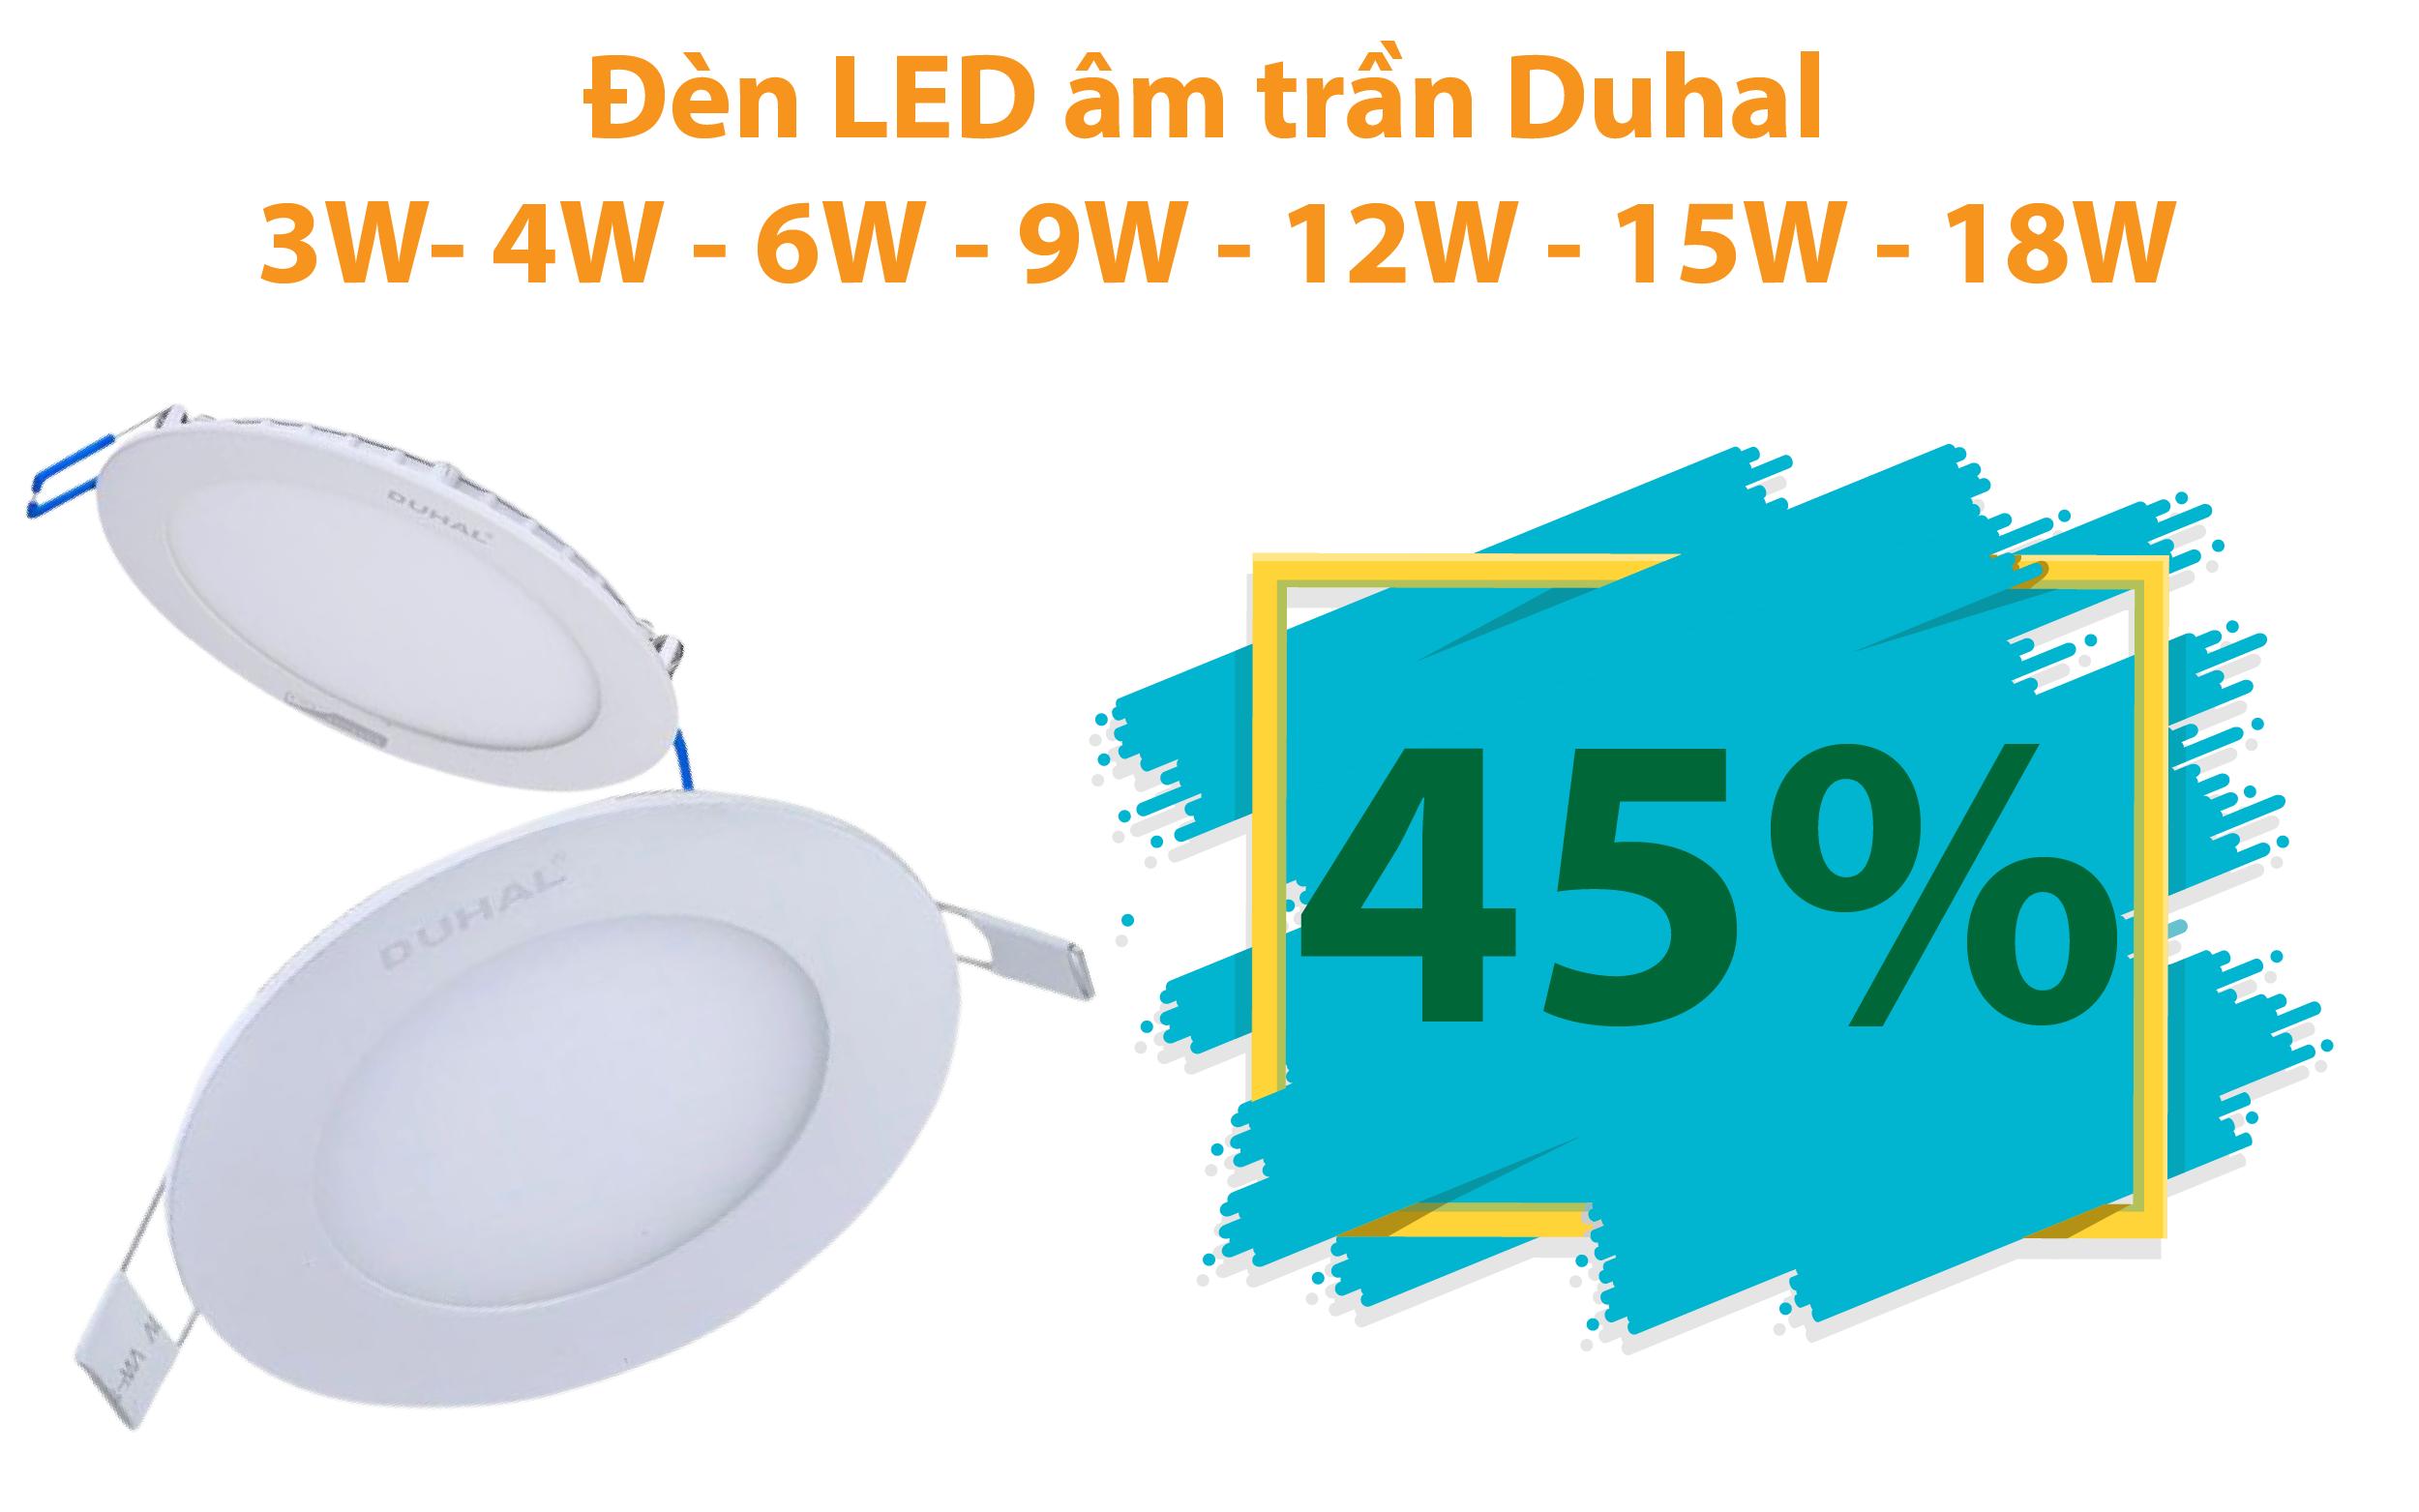 Đèn LED âm trần Panel Duhal 3W- 4W - 6W - 9W - 12W - 15W - 18W giảm 45%